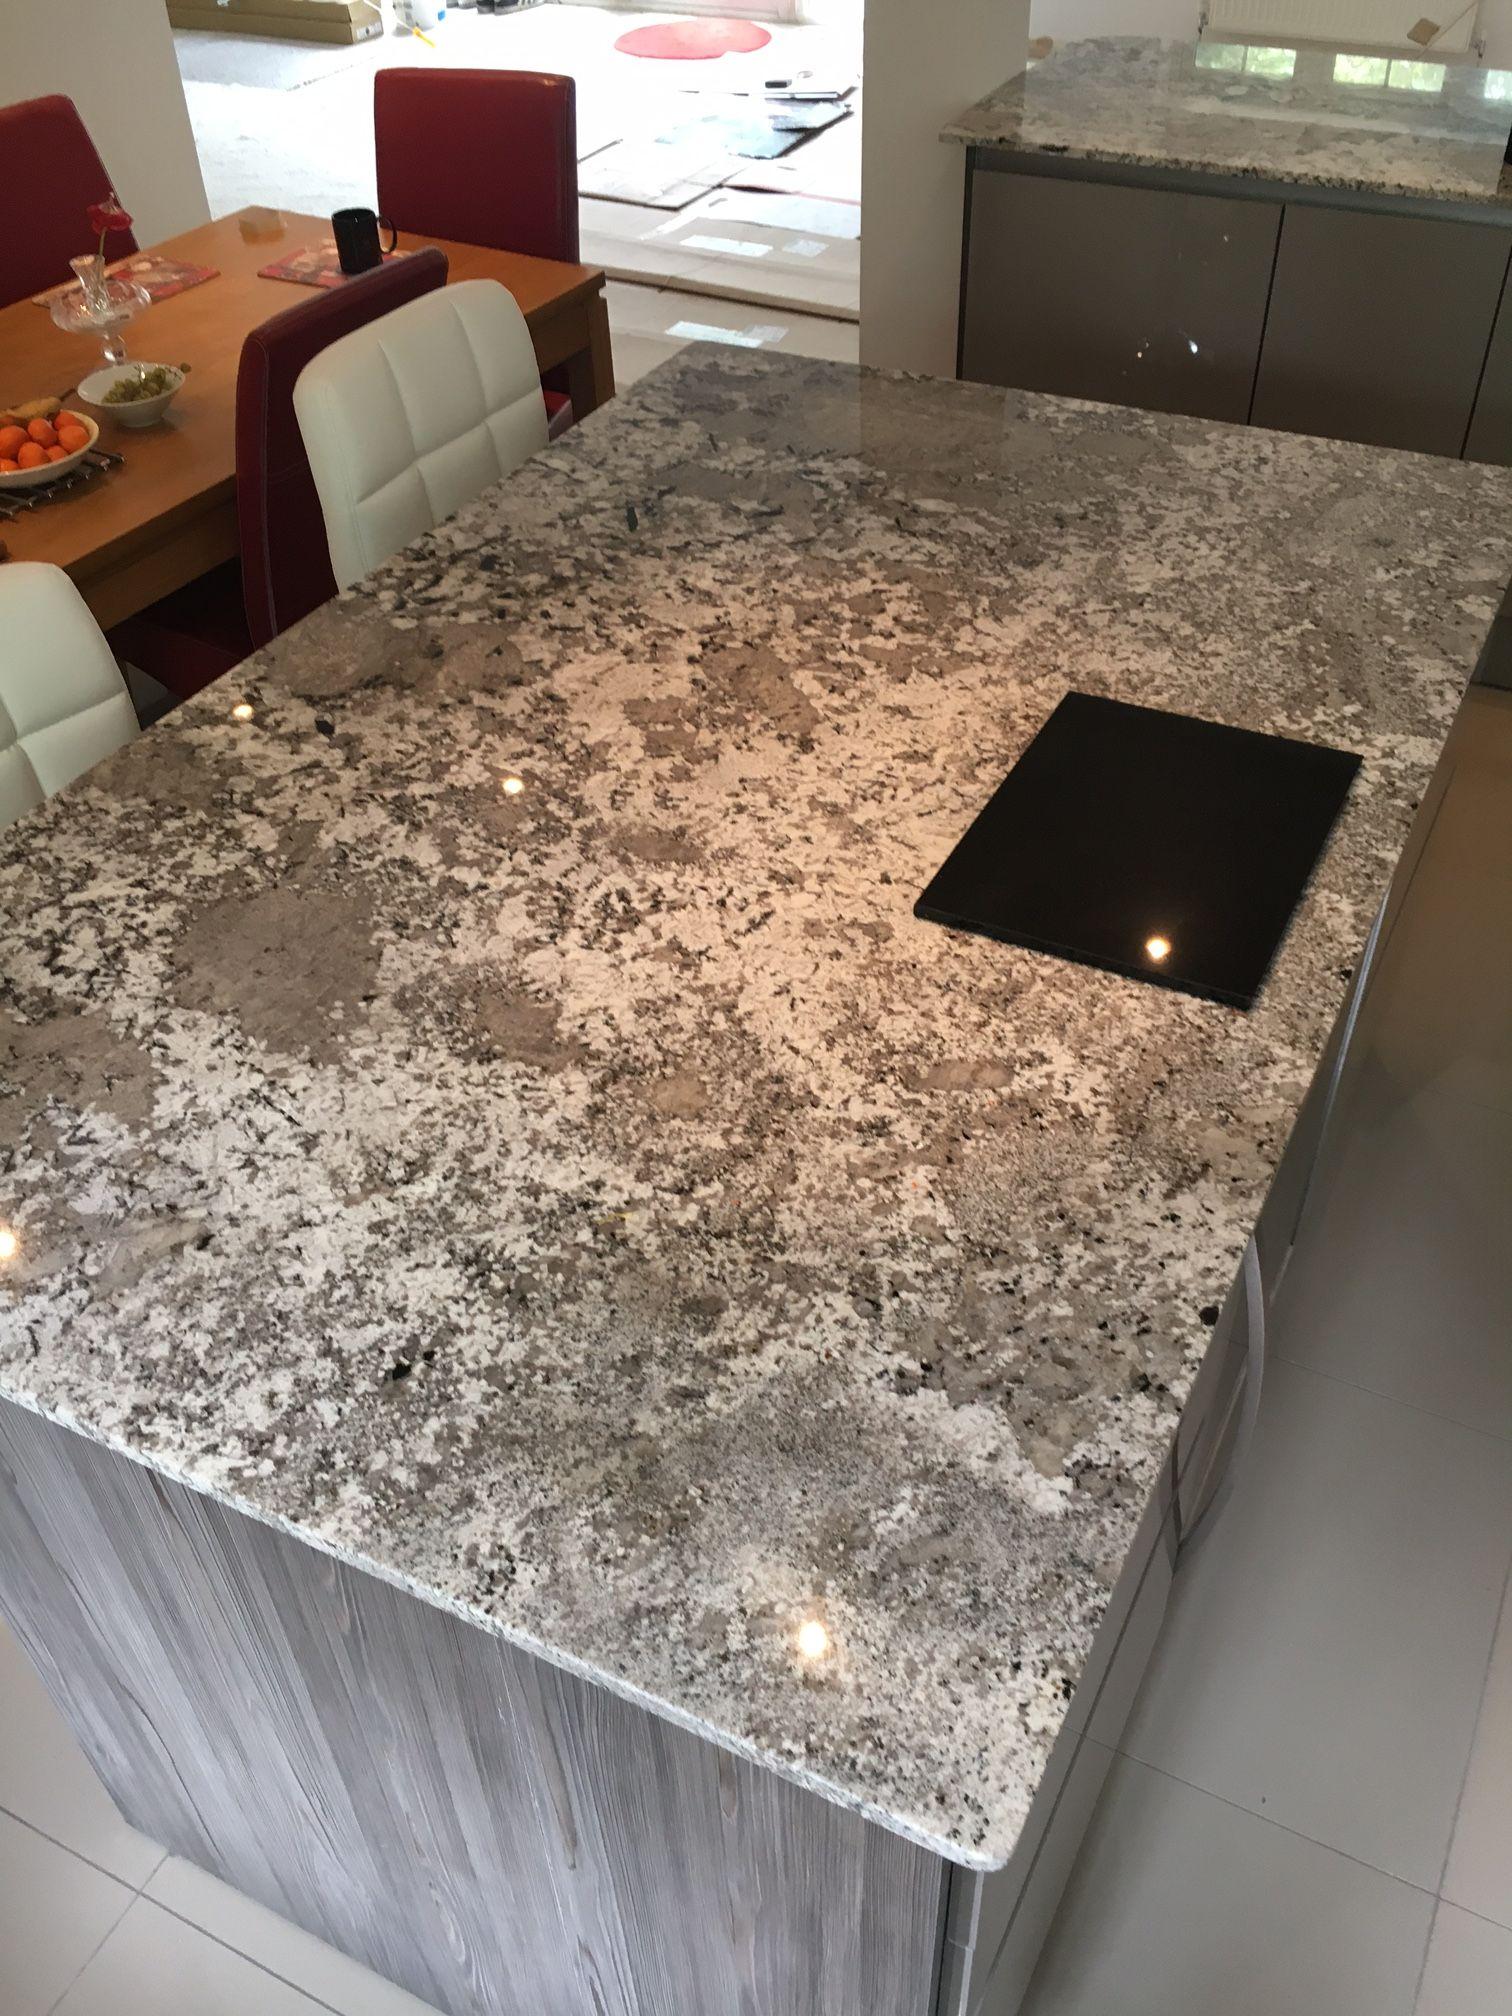 kitchen island in bianco antico granite from the sensa range by rh pinterest com